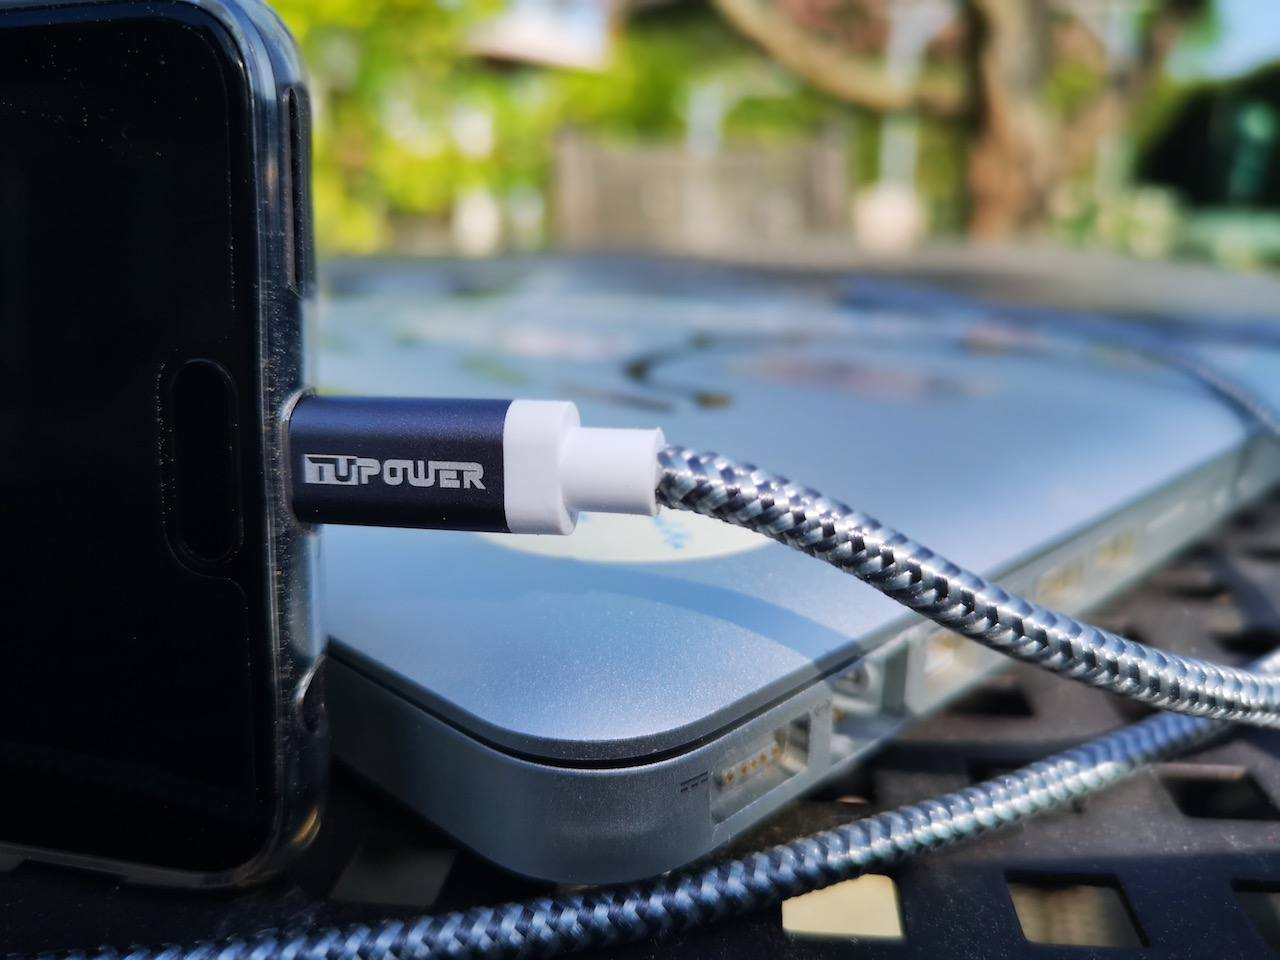 Huawei_honor_usb_c_Ladekabel_schnelles_laden_supercharge_quickcharge2